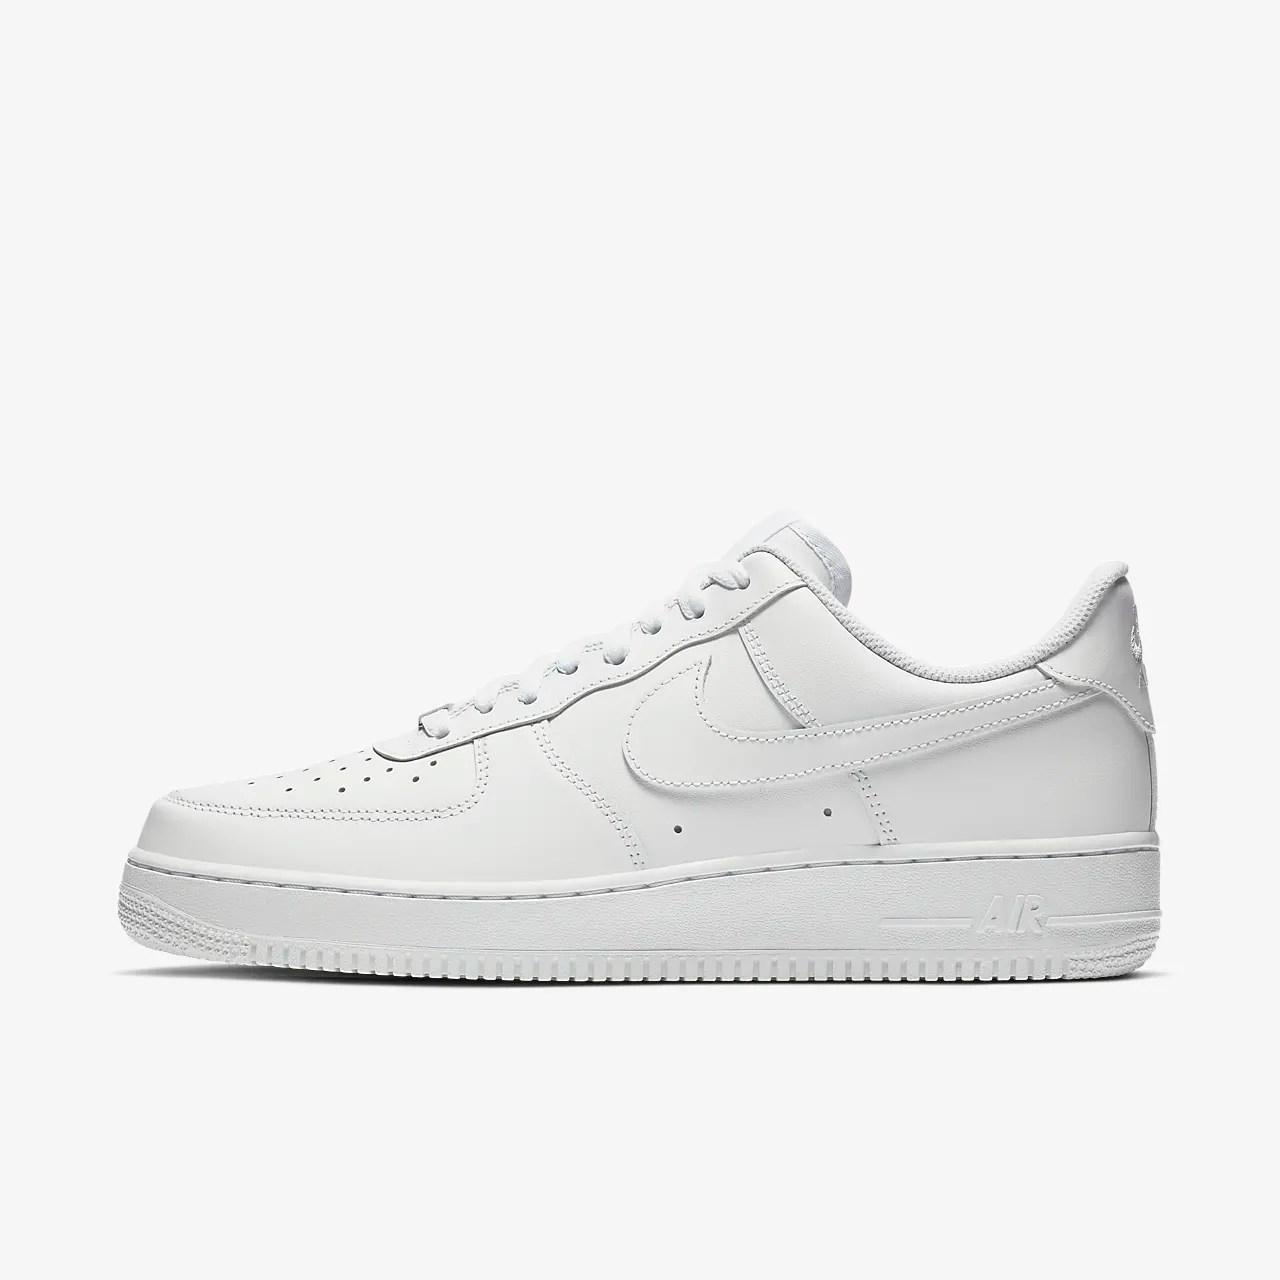 Nike Air Force 1 '07 'White'